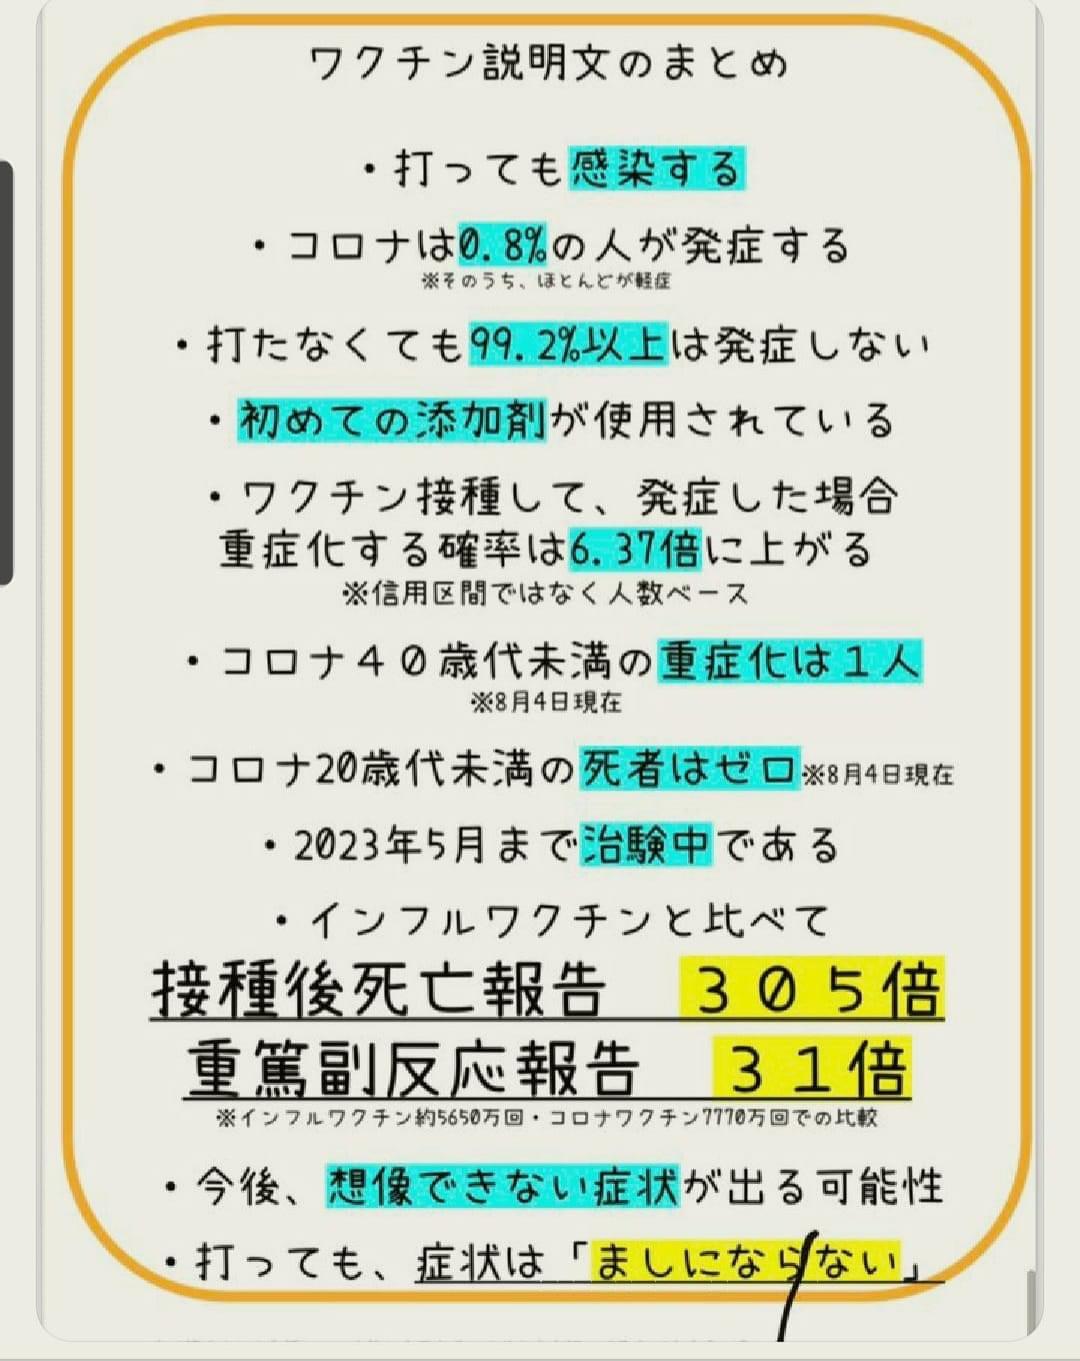 F3E83885-AB18-42D5-8EA8-8151CB2DDAC4